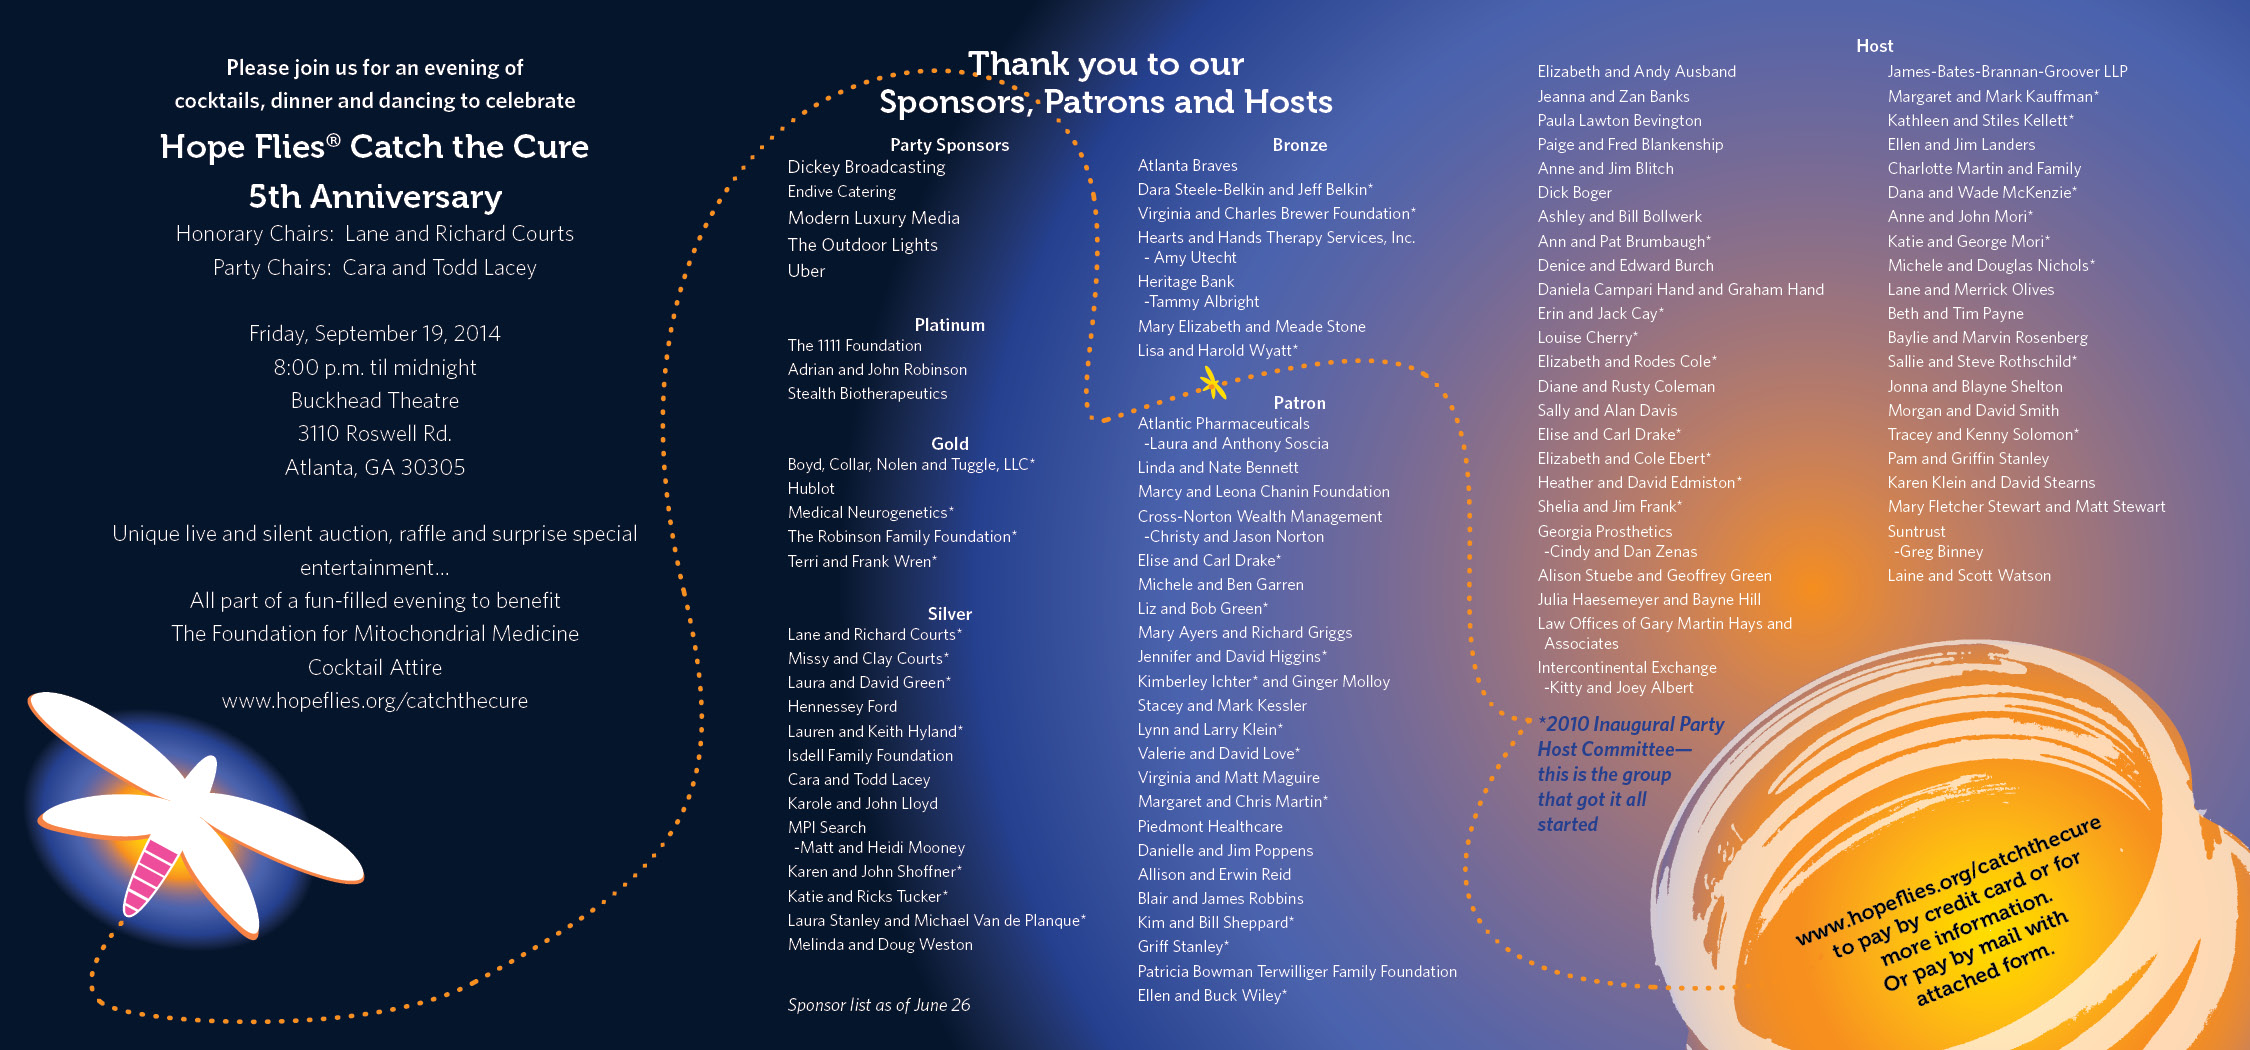 HF-CTC invitation 2014-emailp2